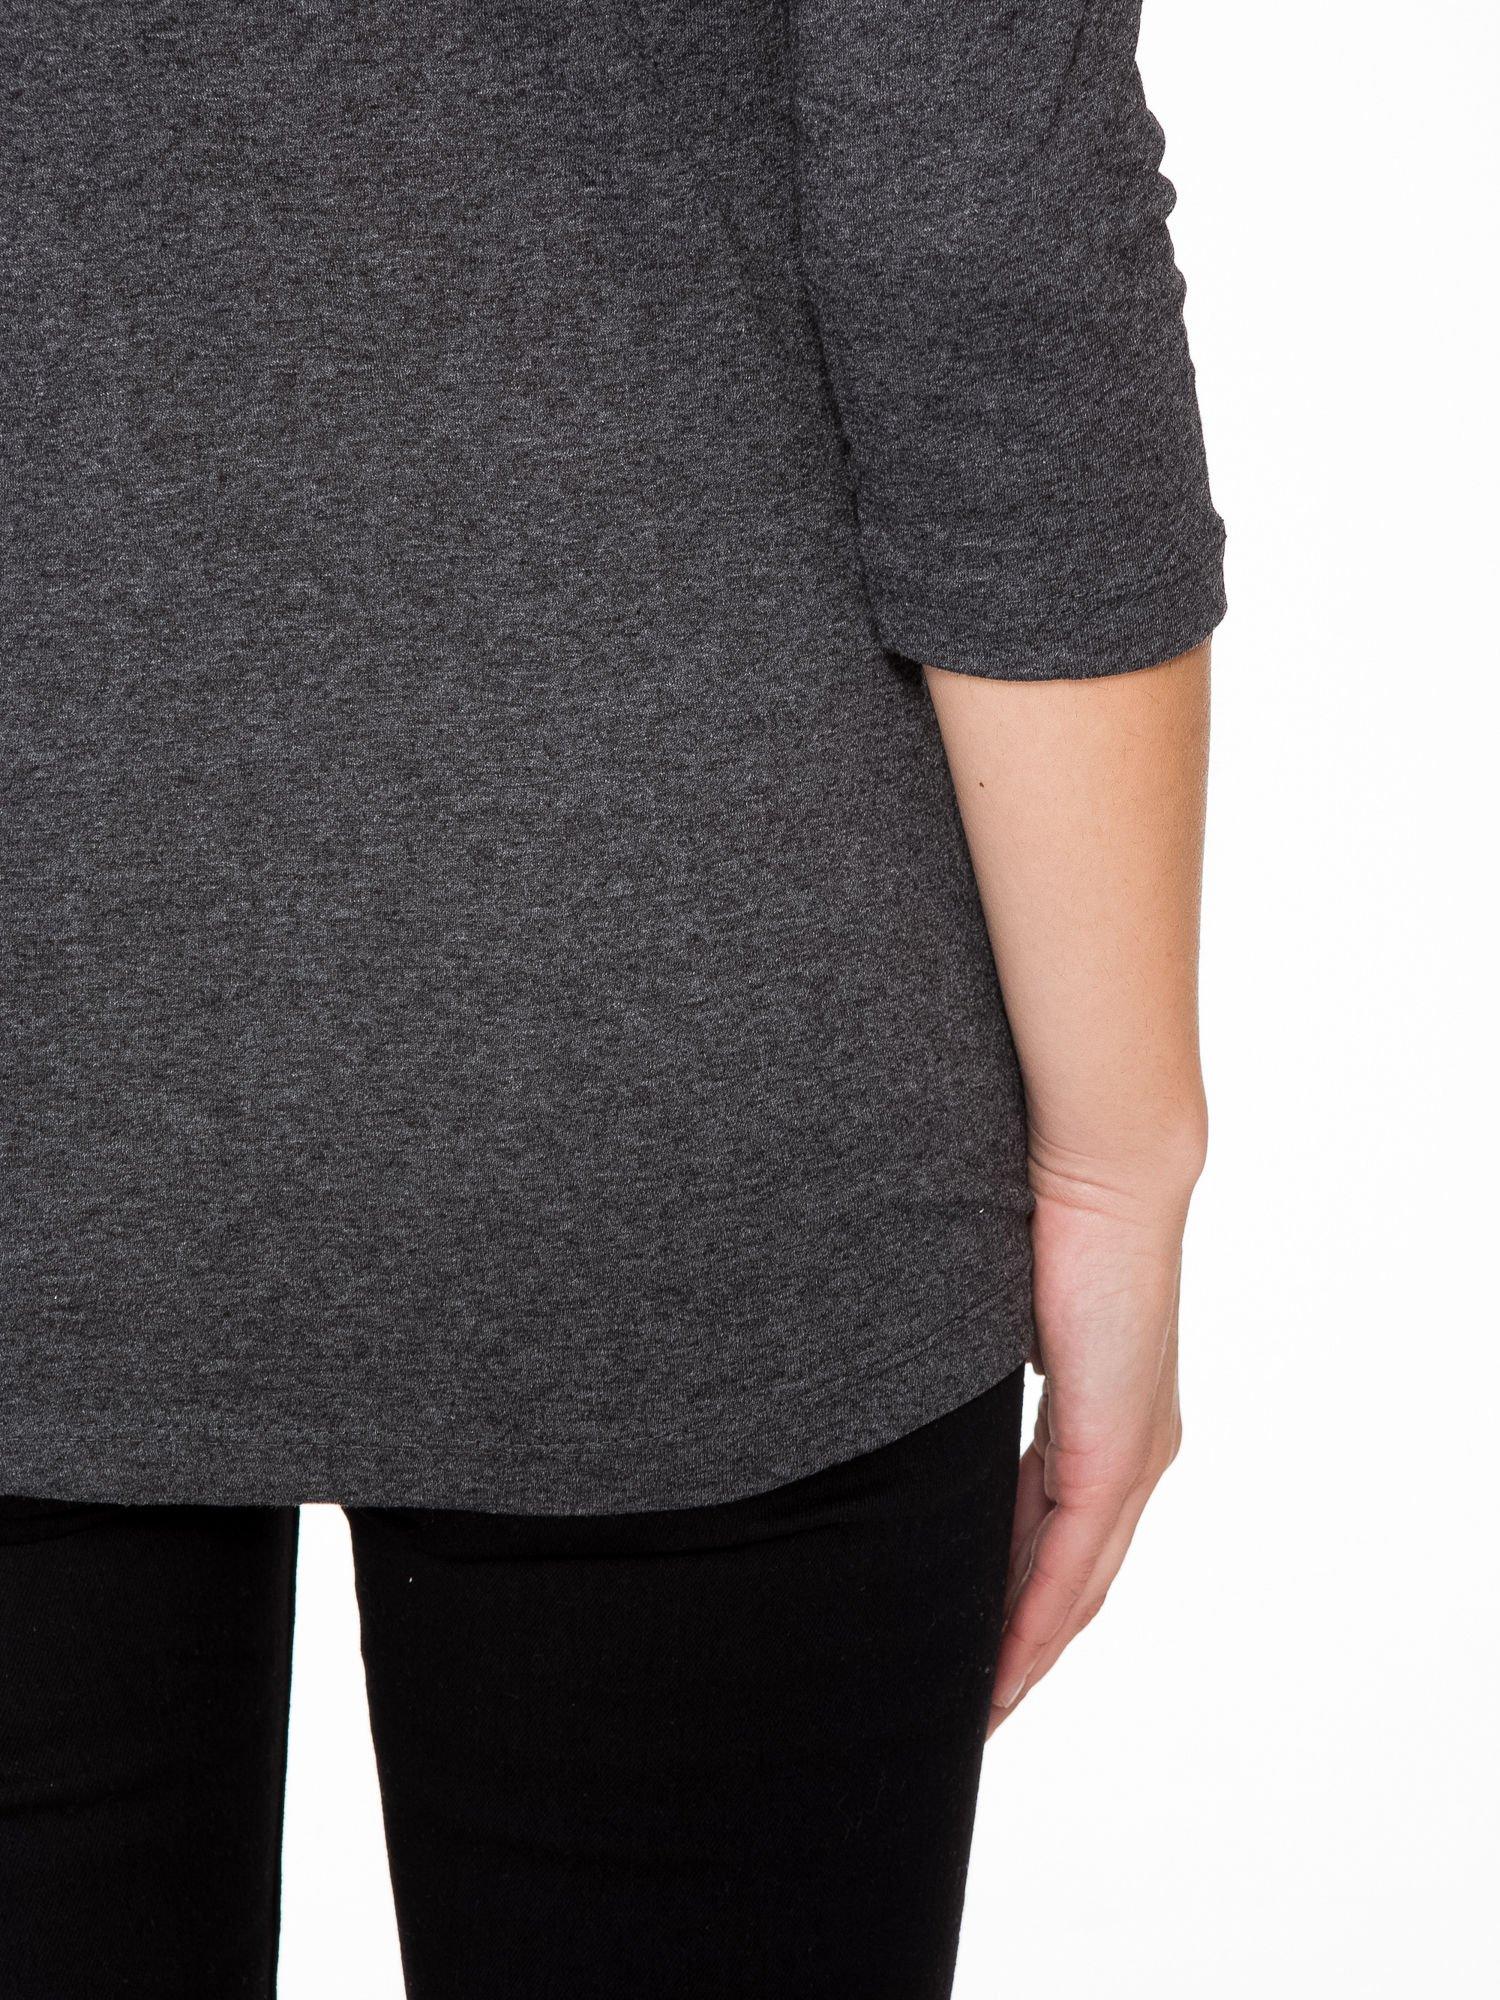 Szara bluzka z portretem Audrey Hepburn                                  zdj.                                  10